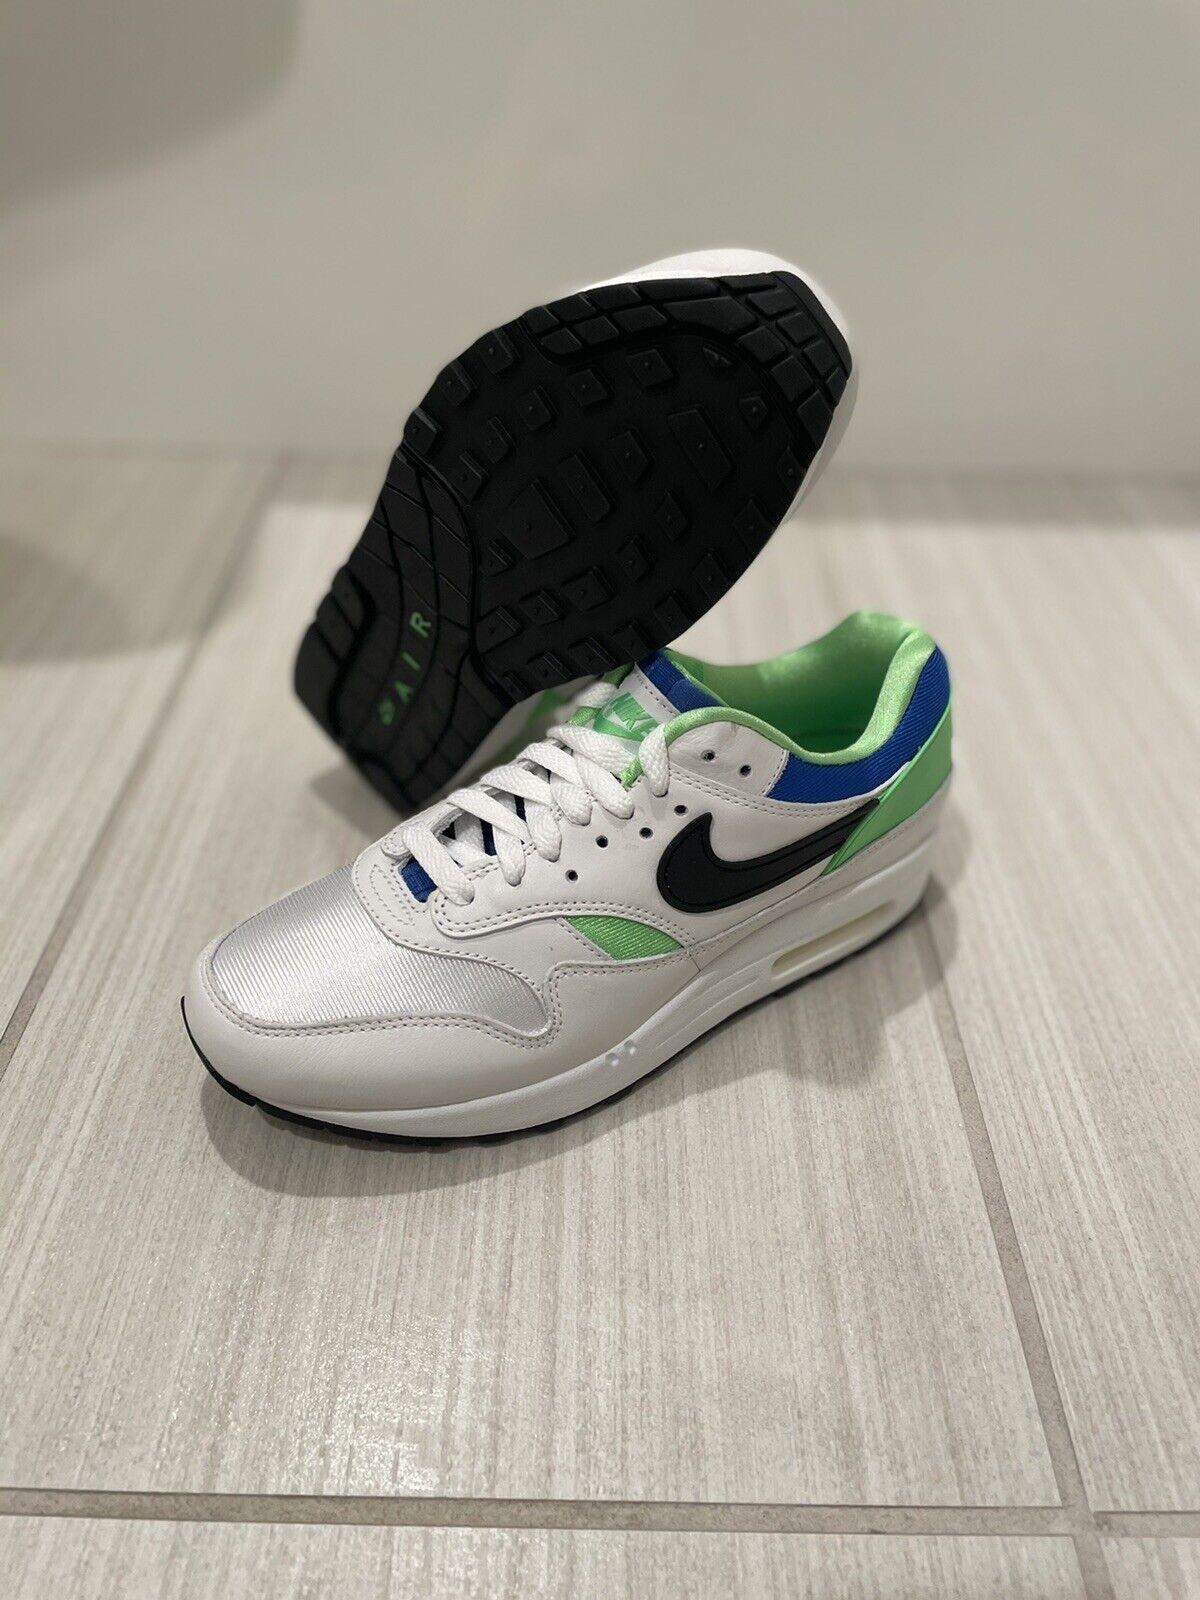 arpón mi Sospechar  Womens Nike Air Max 1 Mid Sneakerboot W/ H2o Repel Sz 6 100 Auth. 685267  003 for sale online | eBay